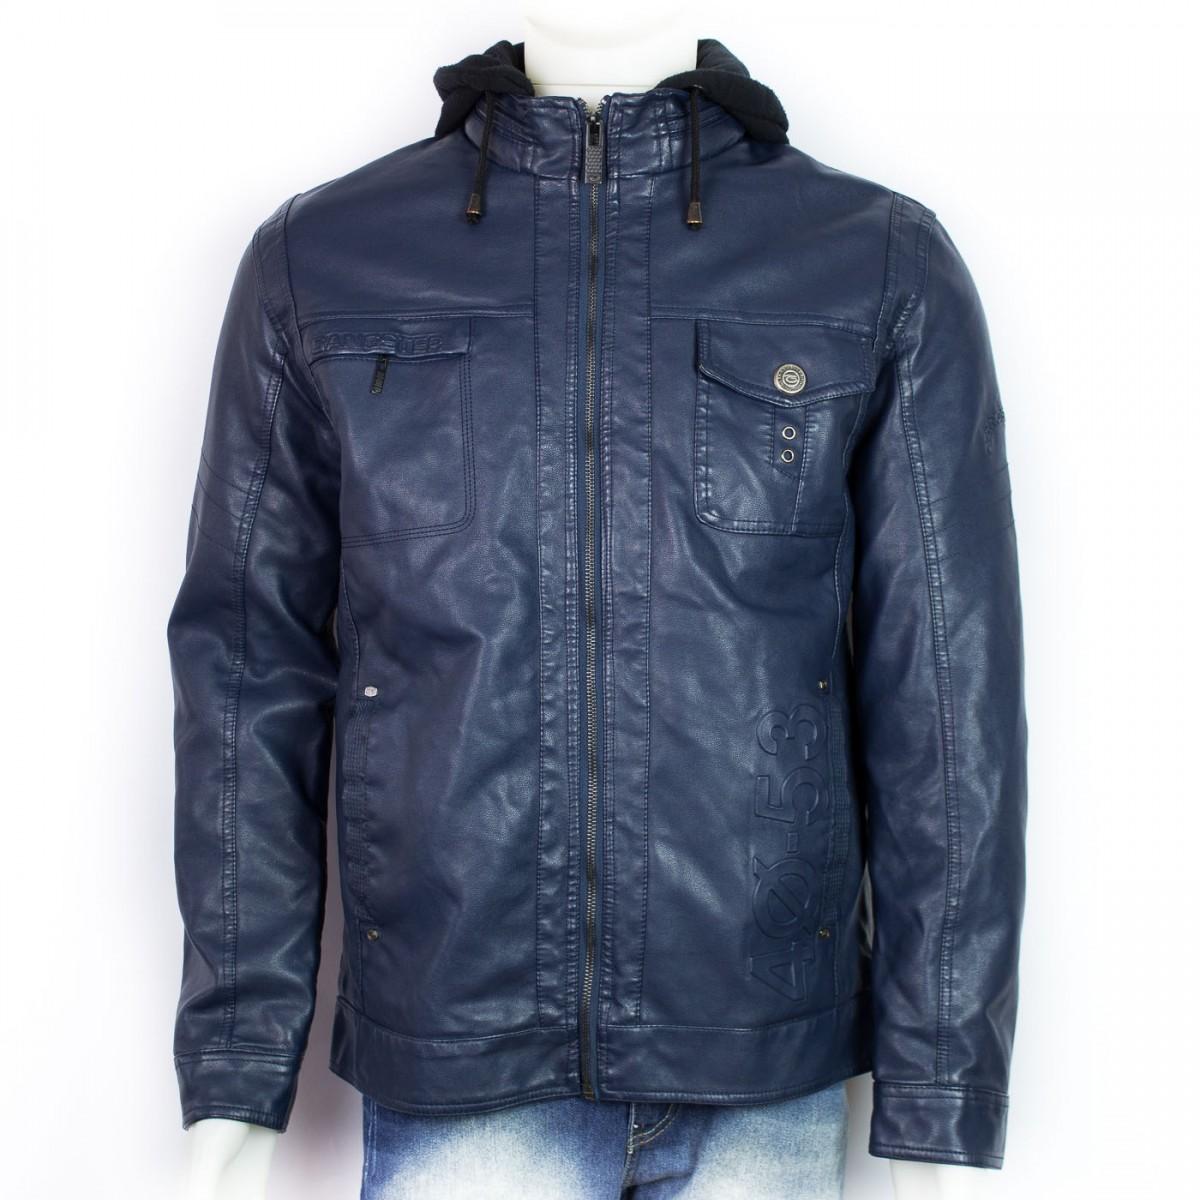 a457656808c04 Bizz Store - Jaqueta Couro Sintético Gangster Masculina Azul